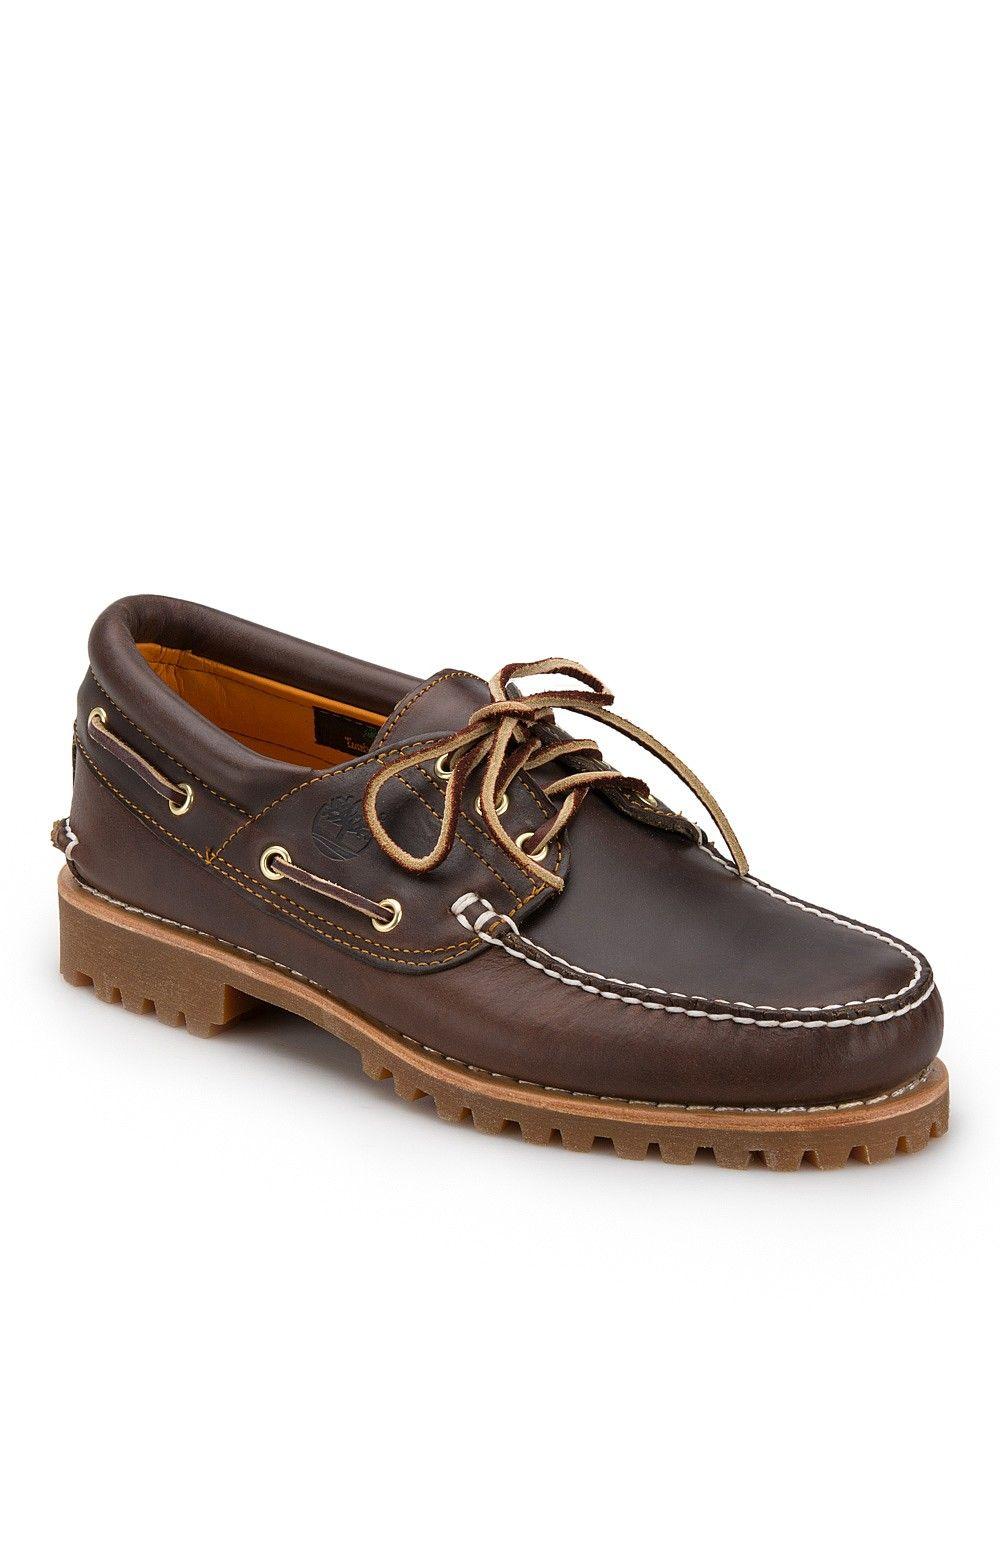 Mens Timberland 3 Eye Boat Shoe in 2020